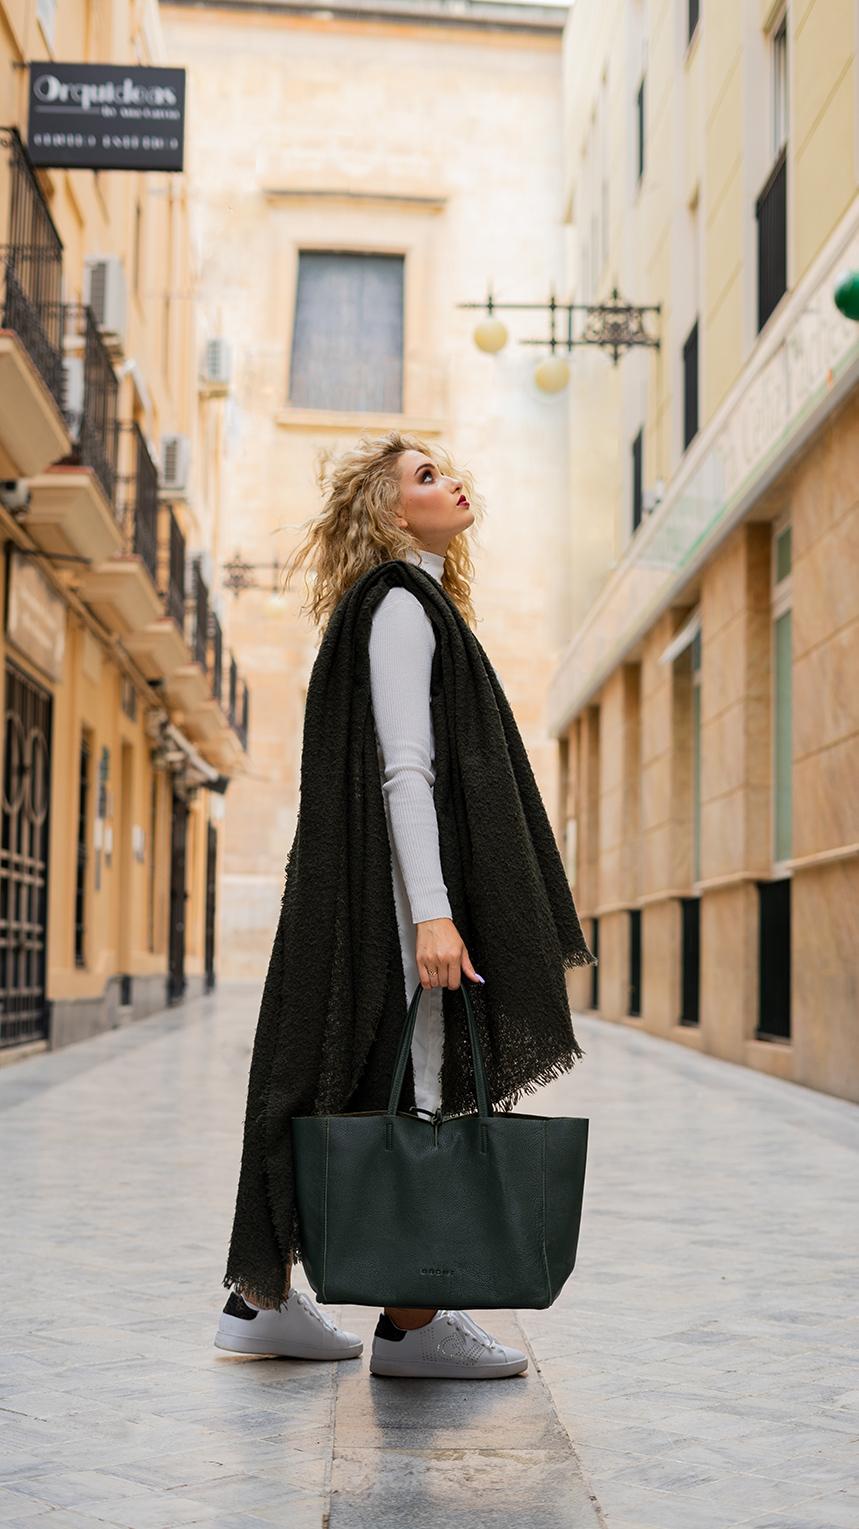 Moda y Ecommerce - Leidy Cano, Fotografía Profesional